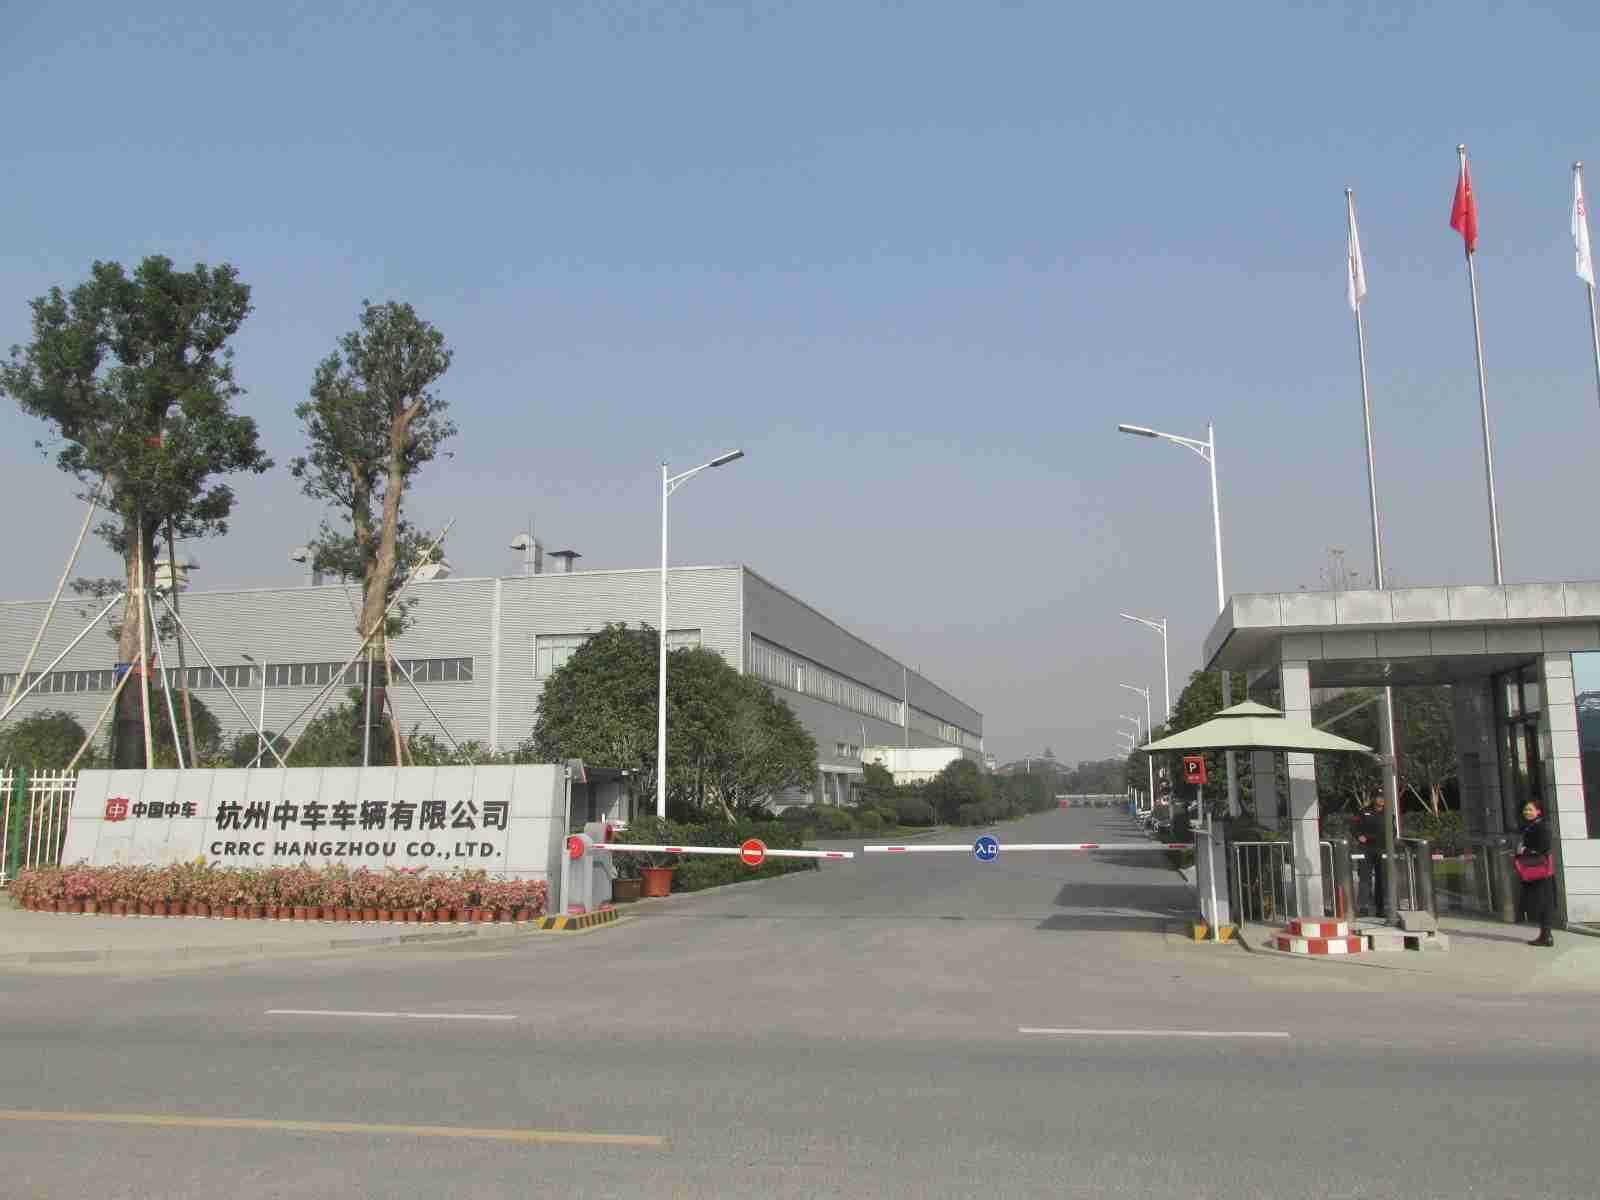 CRRC Hangzhou Co., Ltd.